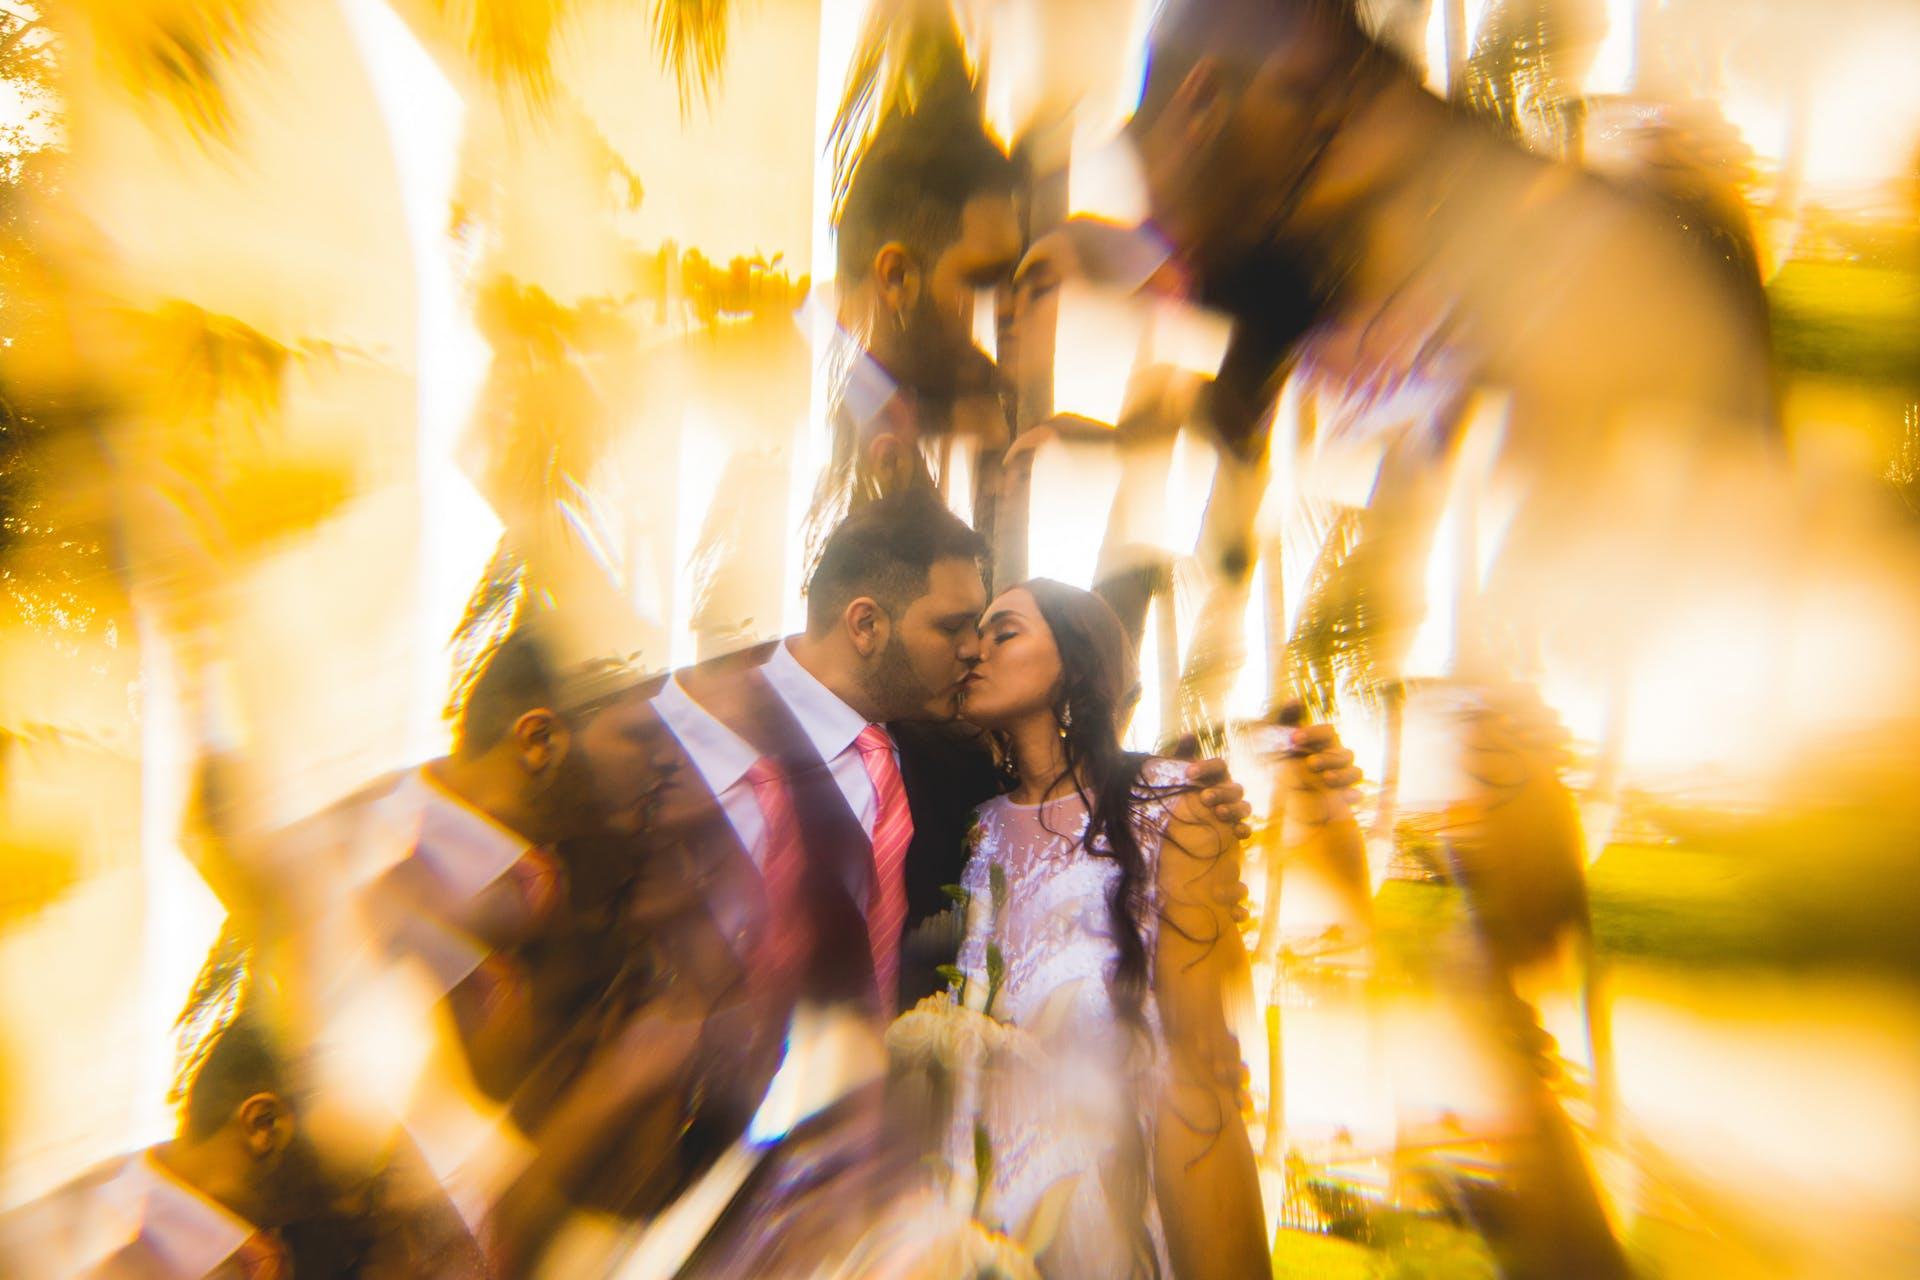 pre-wedding weddingphotography wedding wedding day reflection love